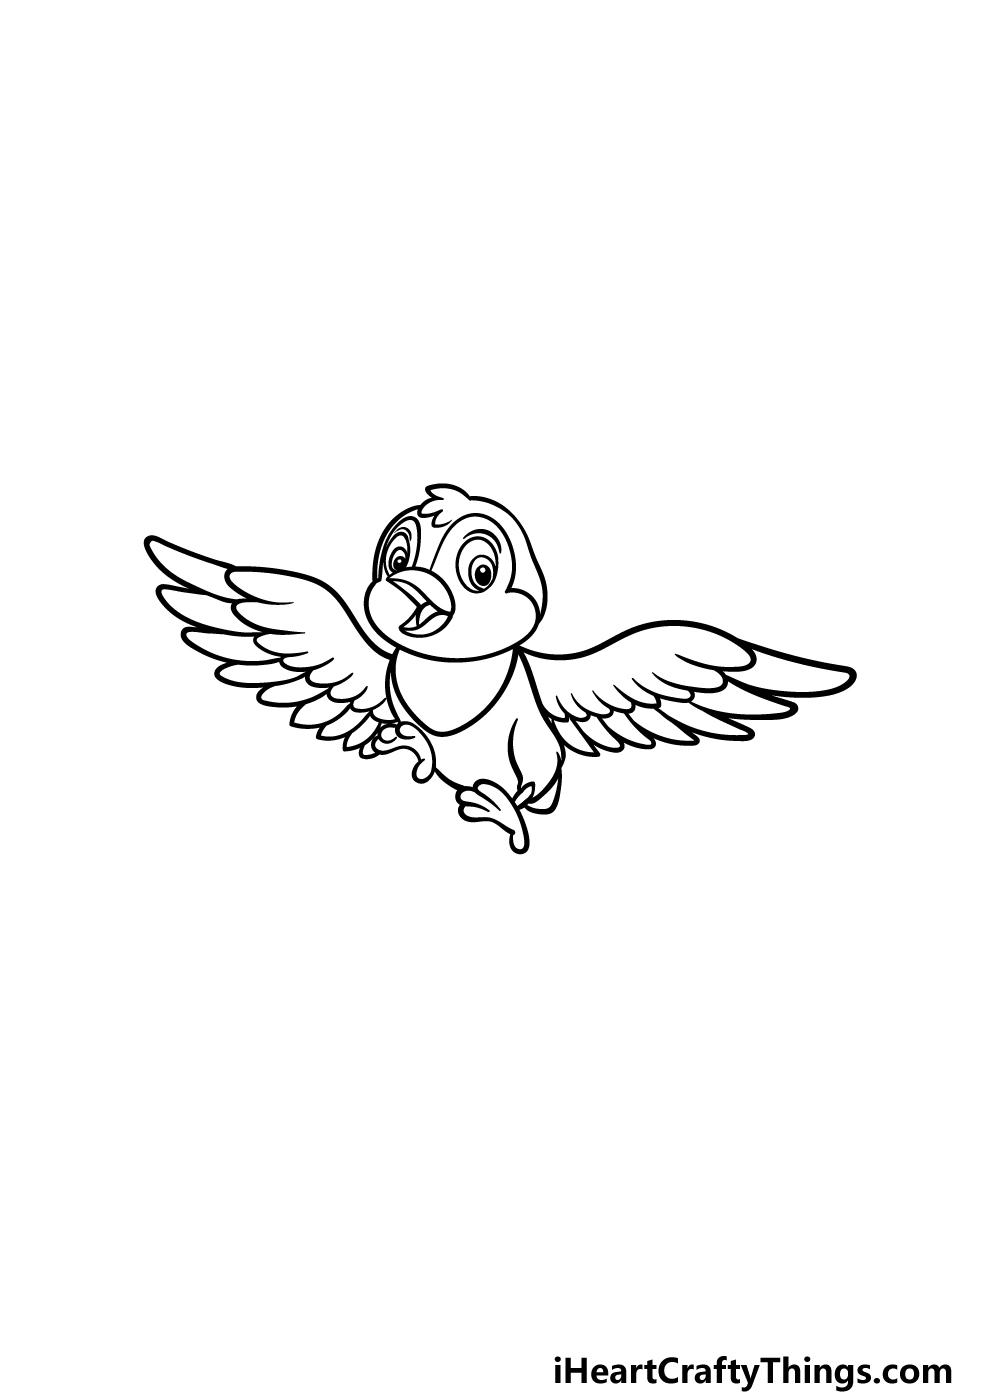 how to draw a cartoon bird step 4